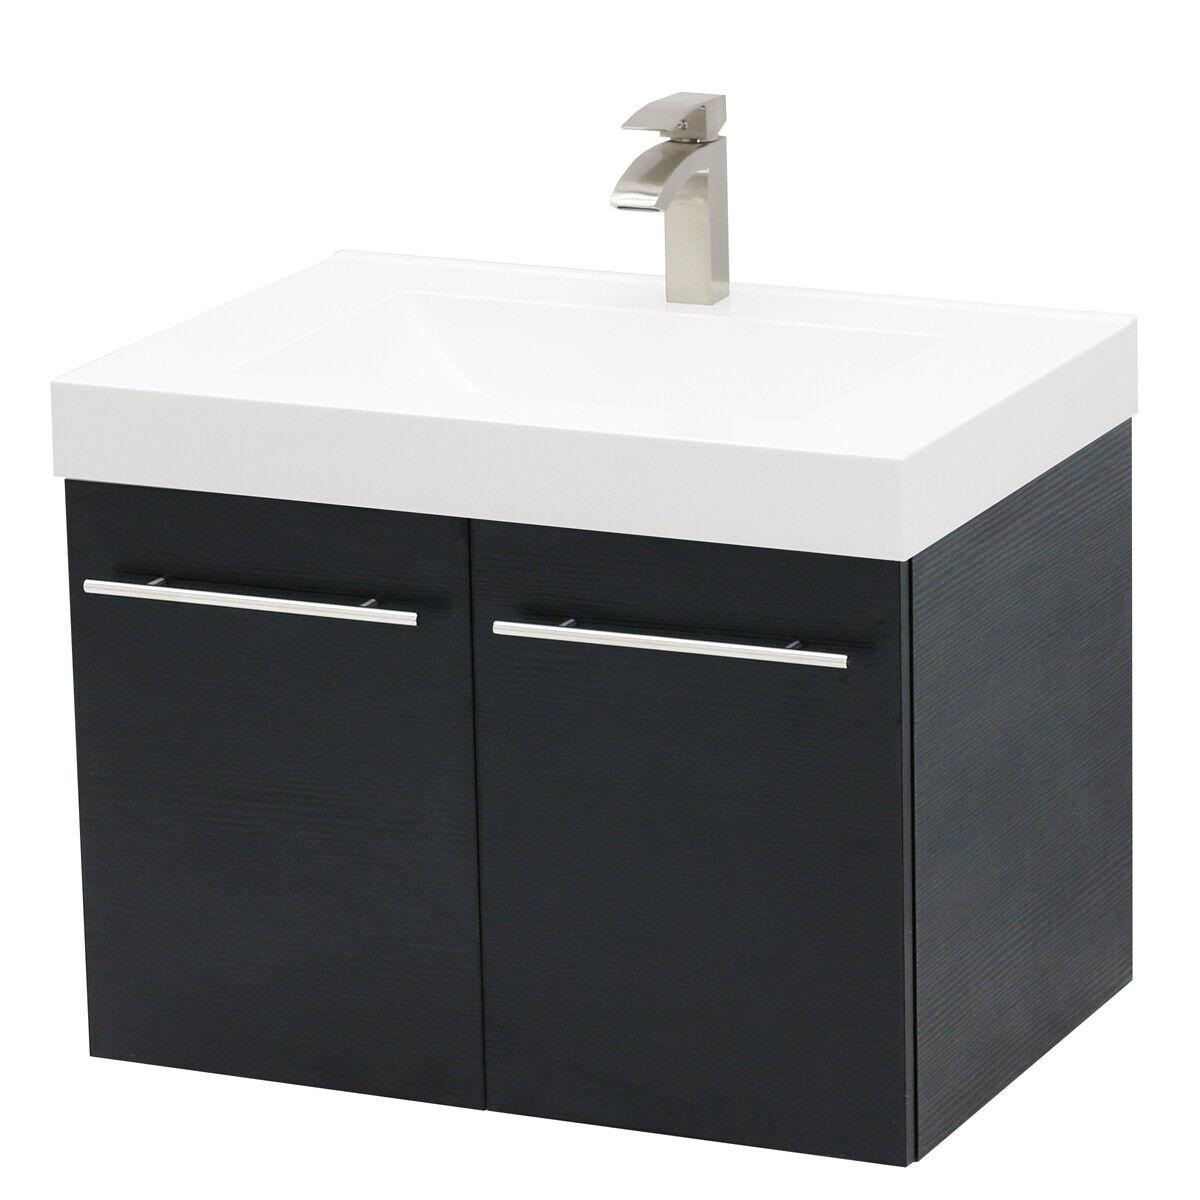 "WindBay 30"" wall mount floating bathroom vanity sink set, Bl"